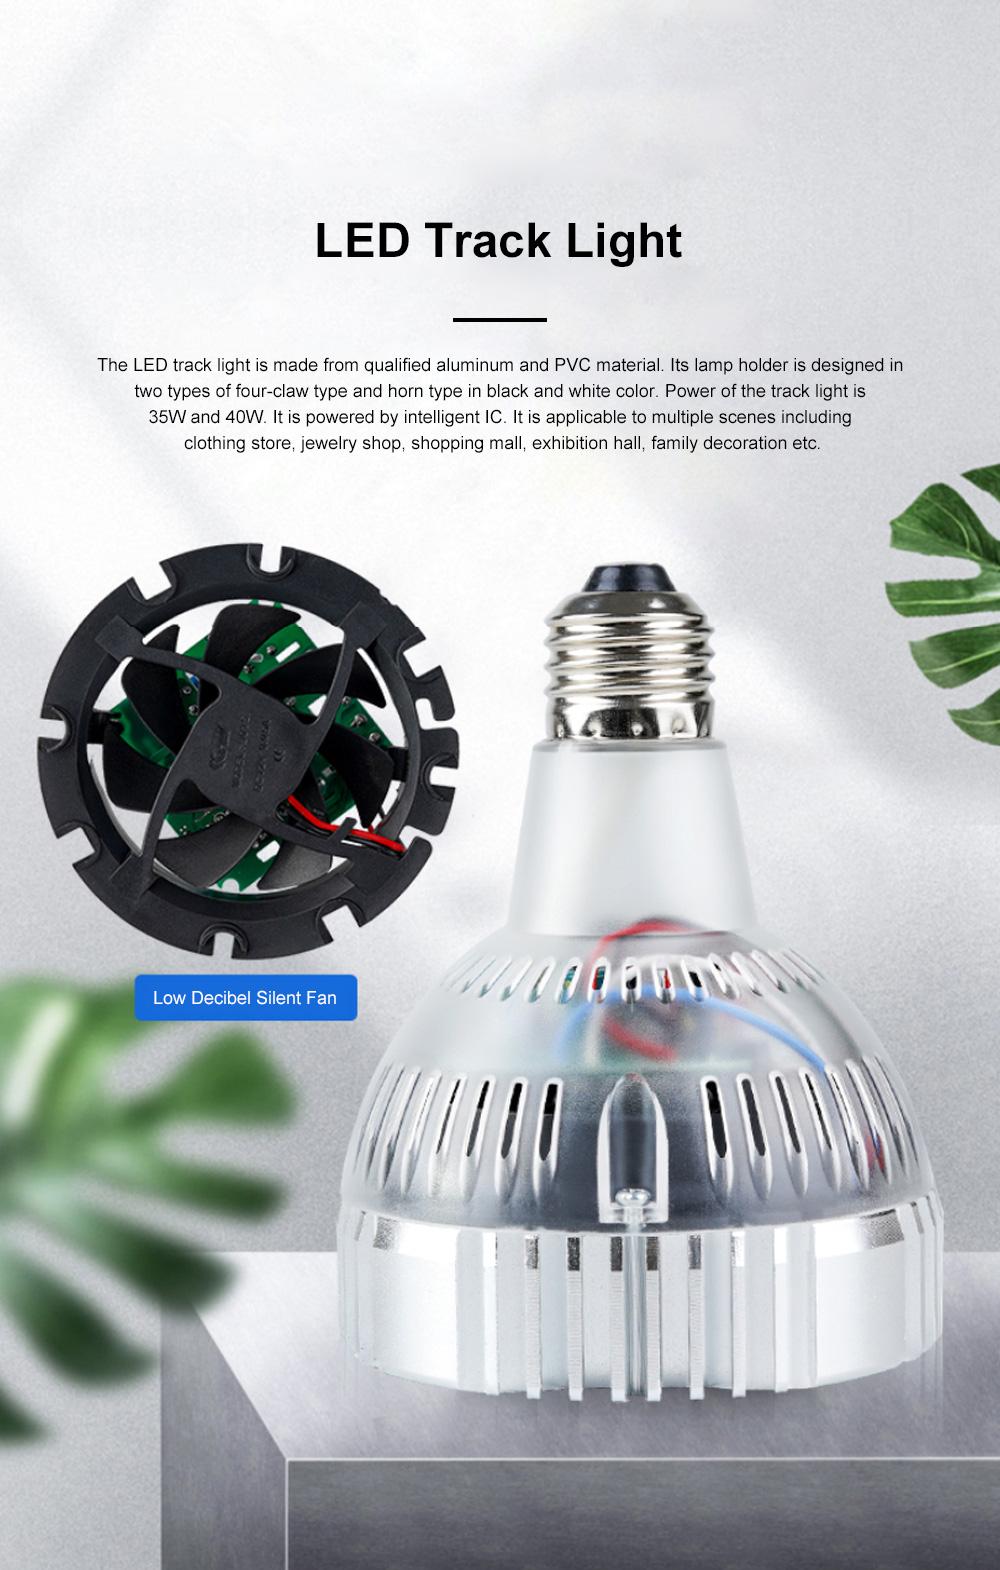 PAR30 Ultra-bright LED Track Lighting for Clothing Store Art Gallery Warm Light LED Track Lamp Free Rotation Lazy Arm Tracking Spotlight 0